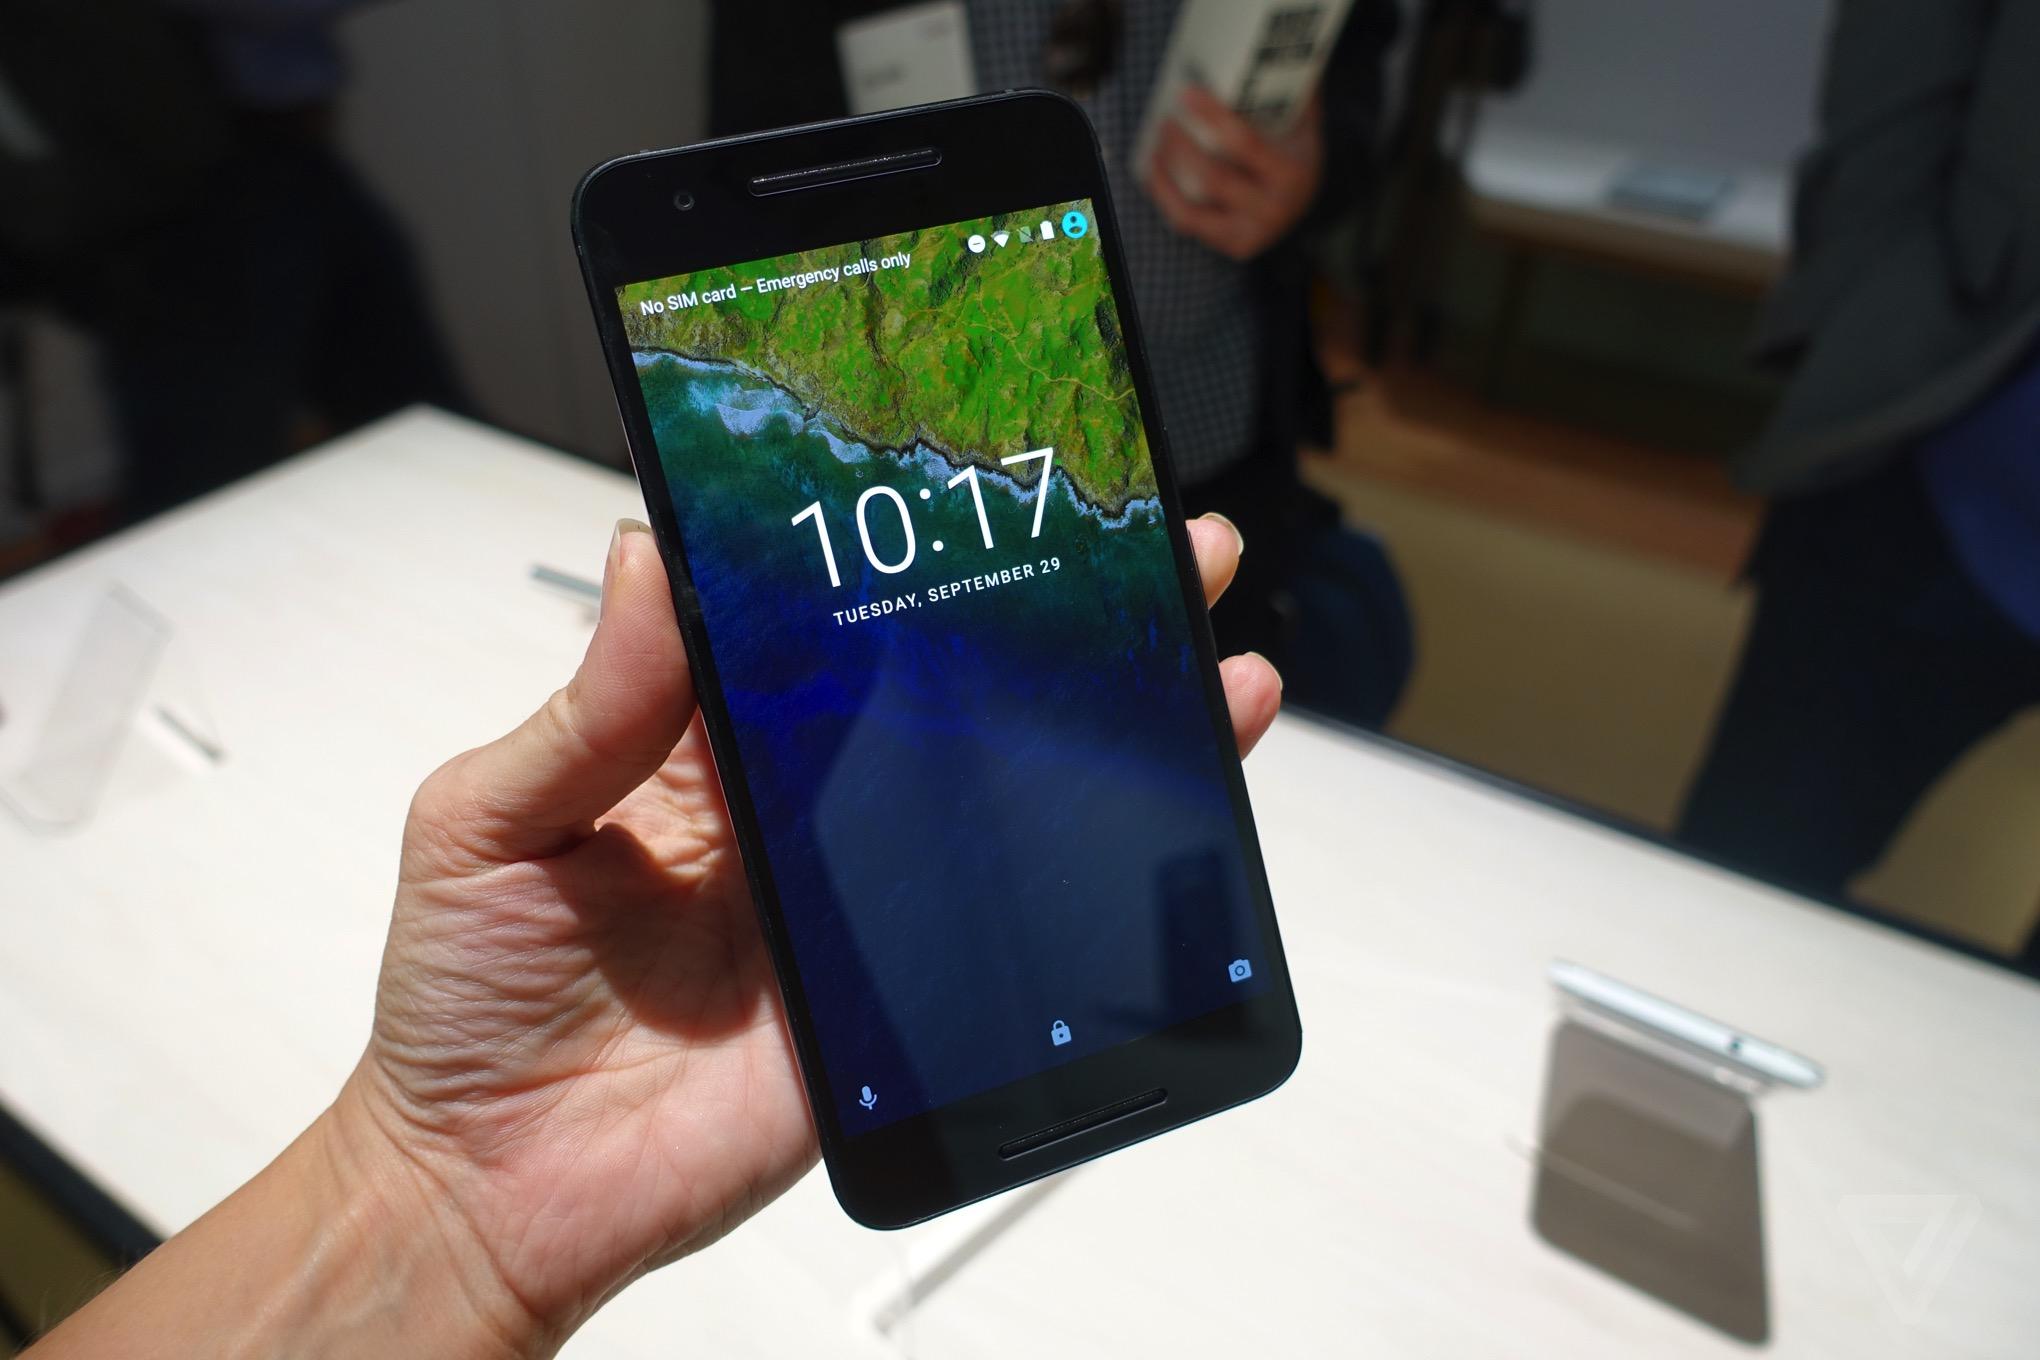 Hands-on with Google's new Nexus 6P smartphone - The Verge